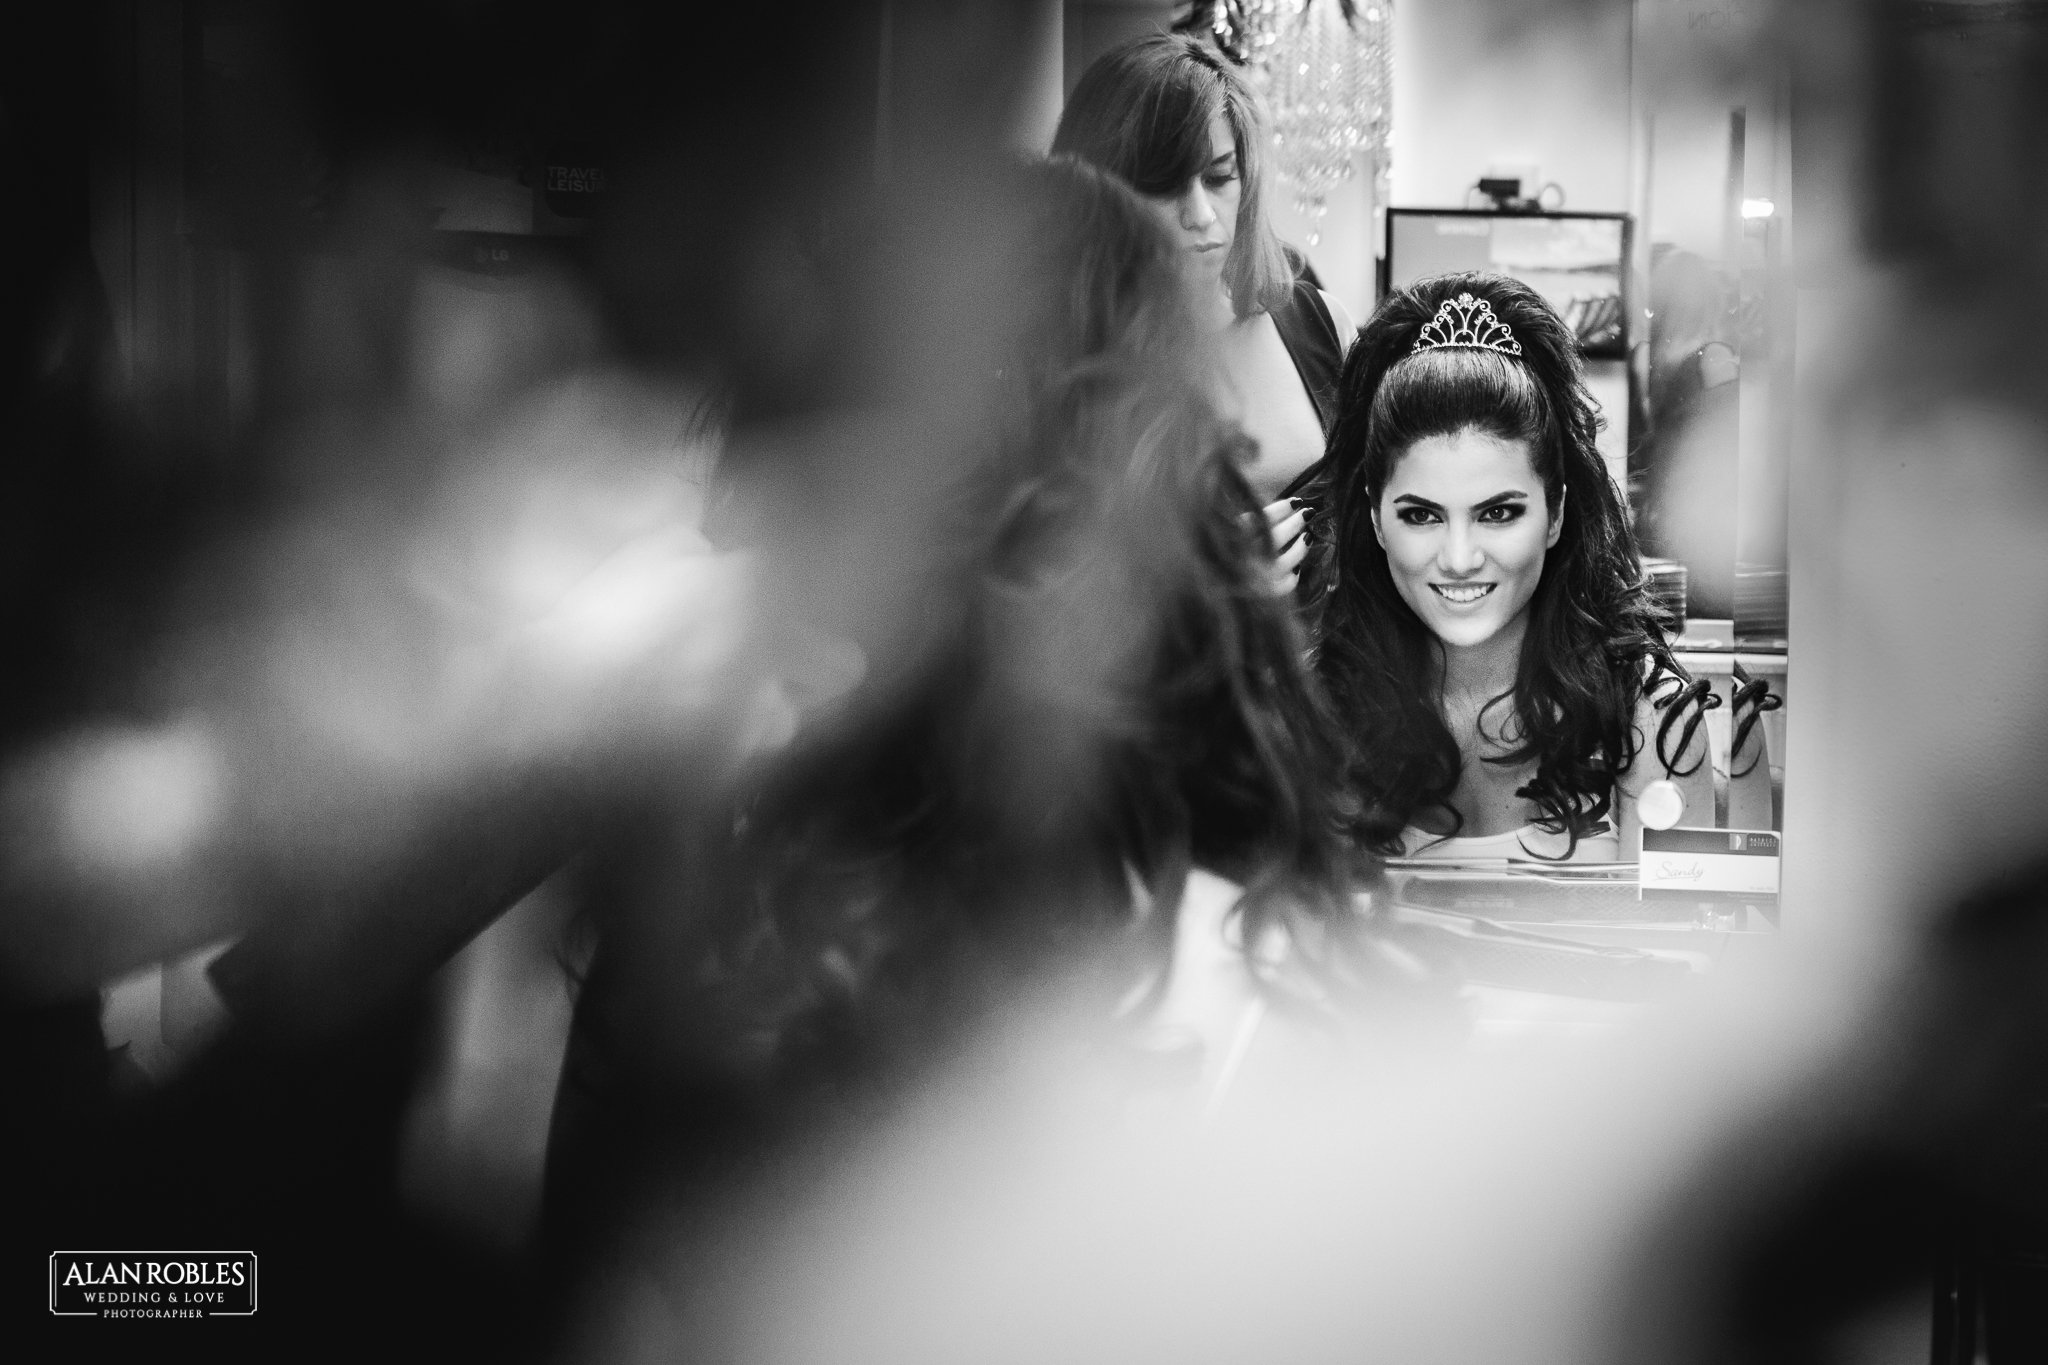 Getting Ready en Salon Patrice en Guadalajara Bugambilias. Fotografo de Bodas Alan Robles Wedding & Love Photographer.